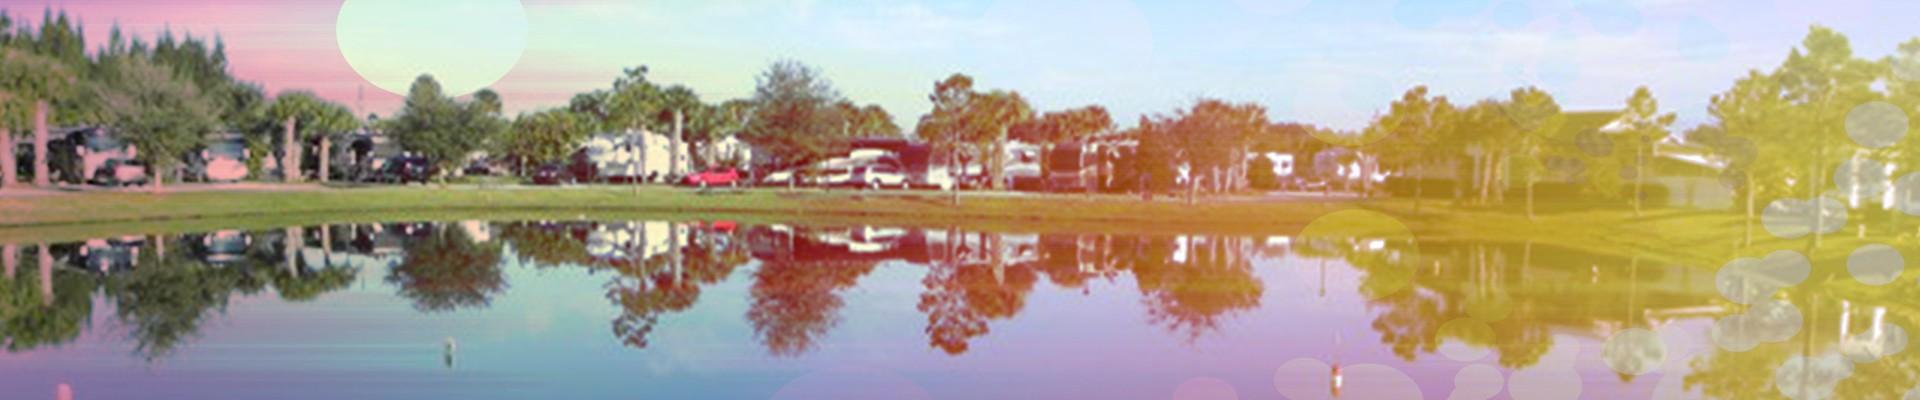 Treasure Coast RV Resort in Fort Pierce Florida